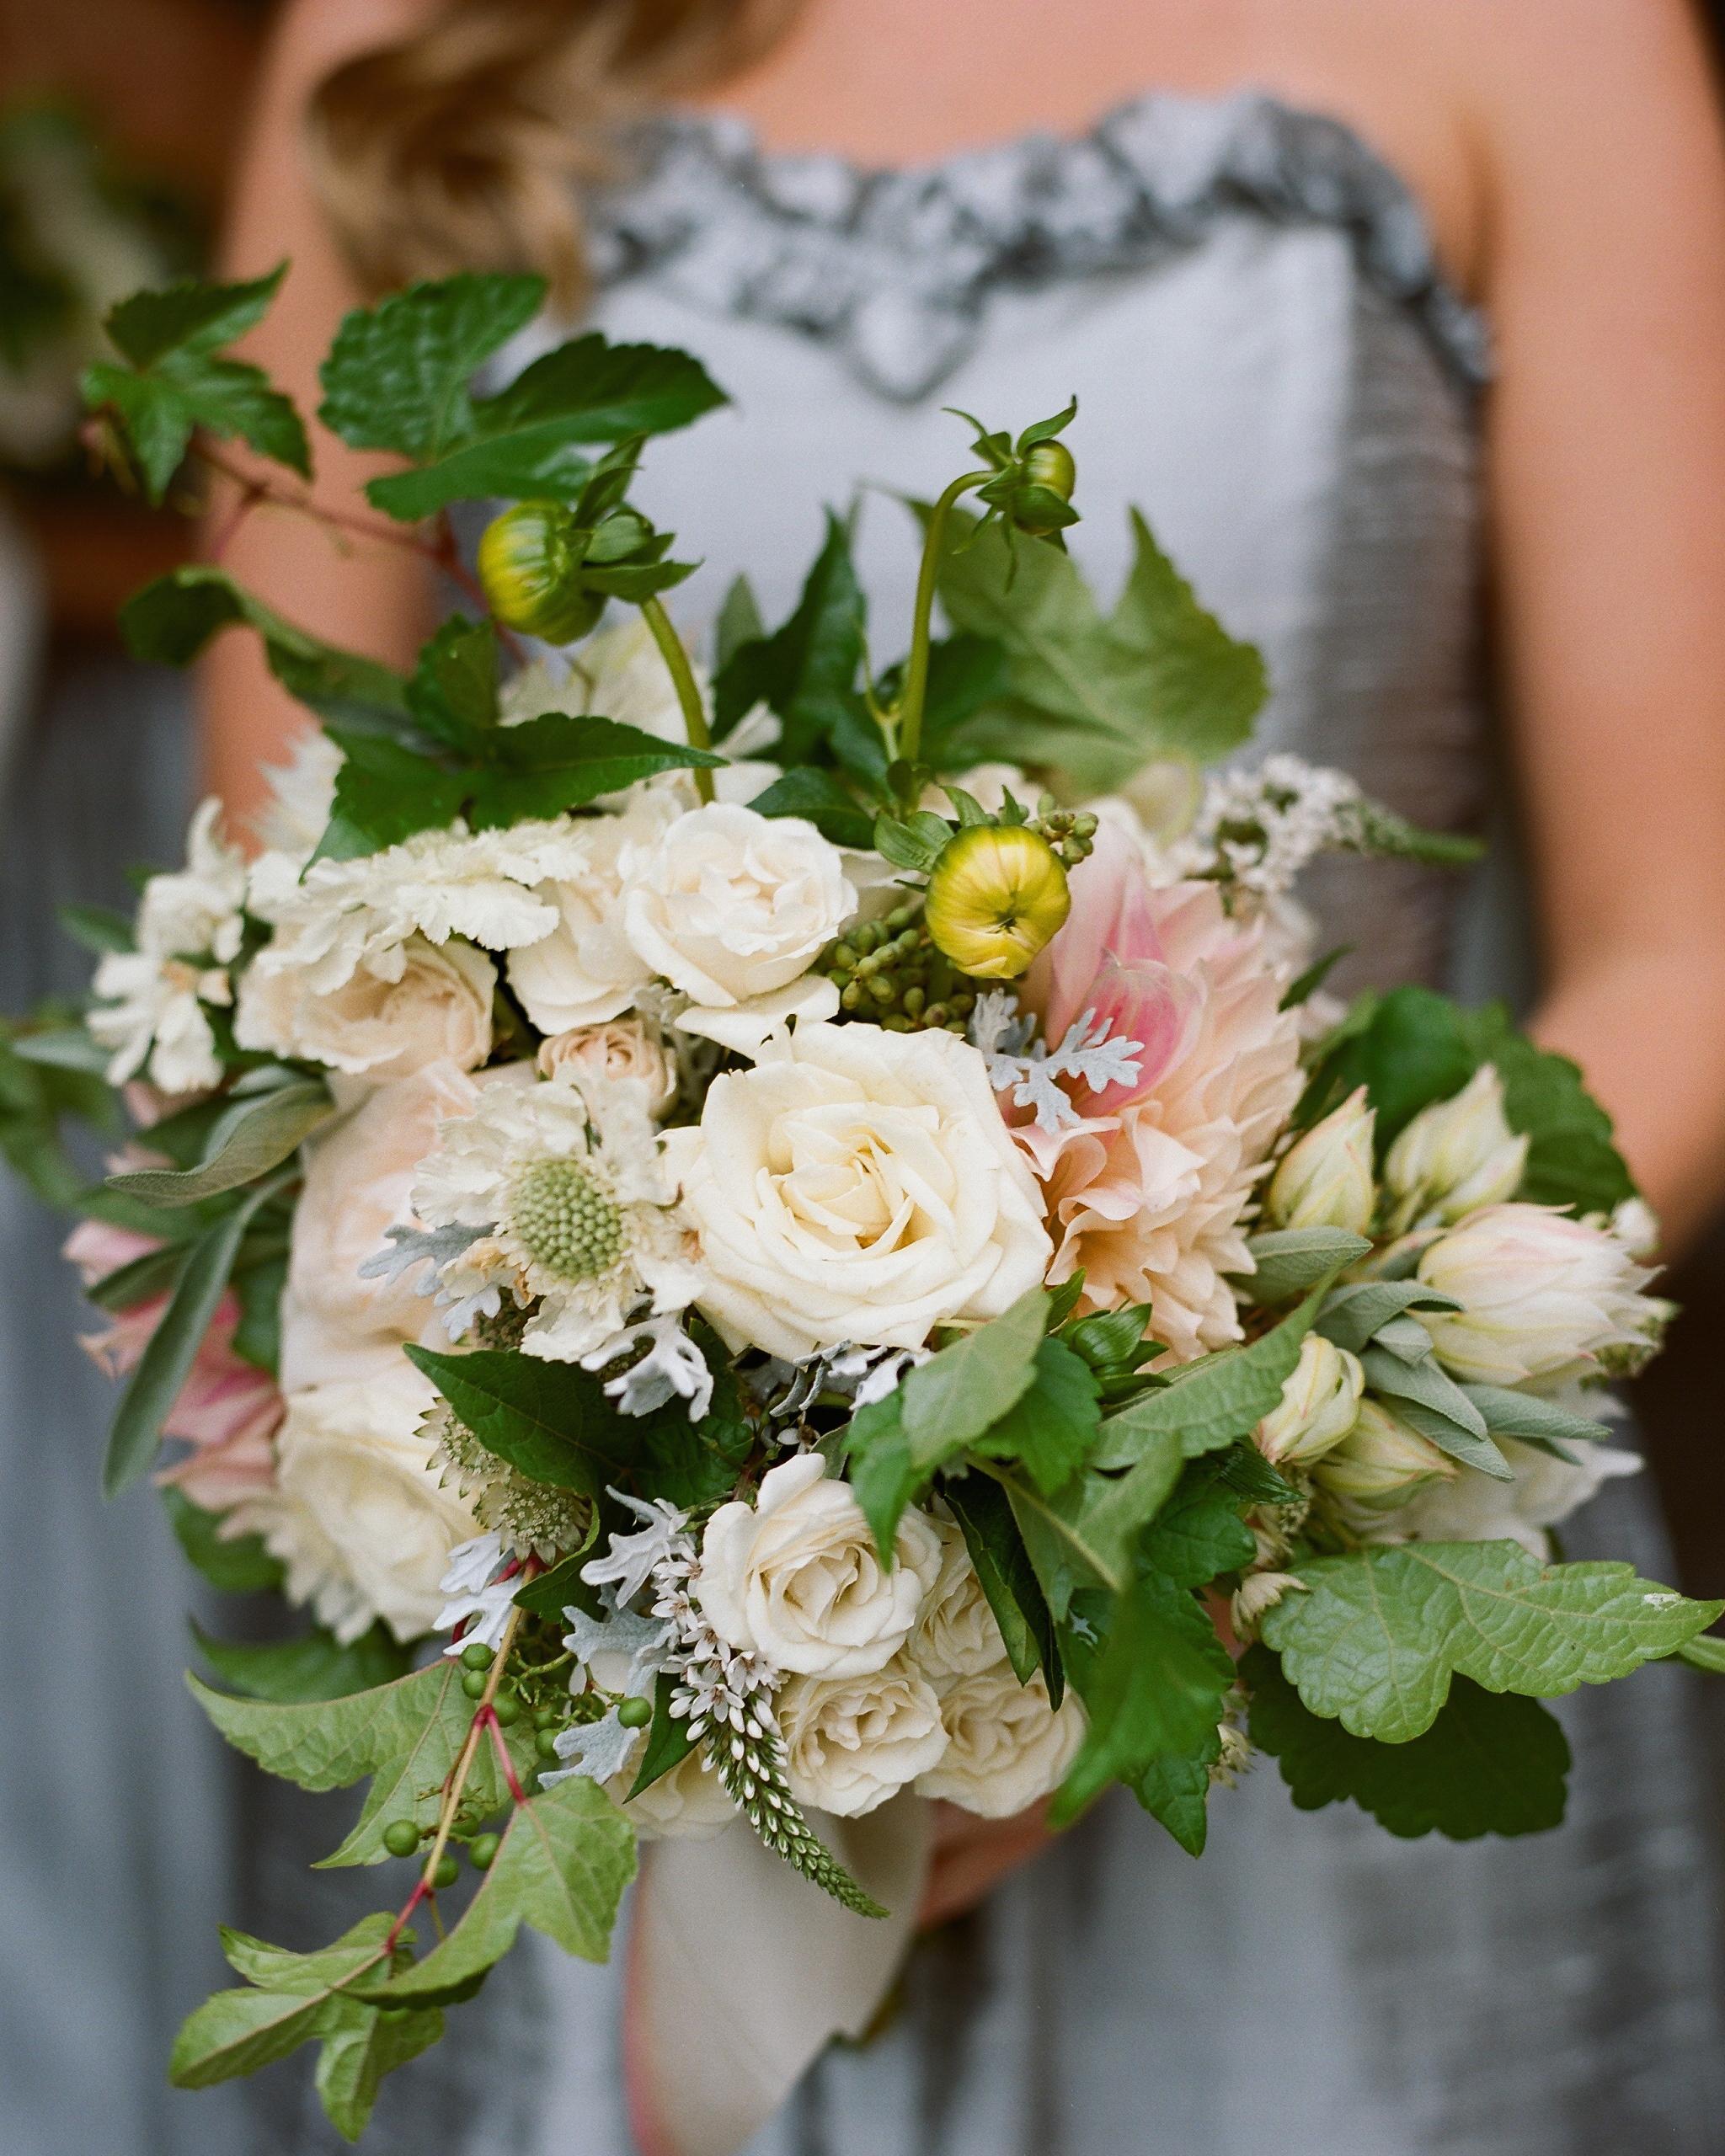 cameron-jake-wedding-maryland-0259-s112481.jpg